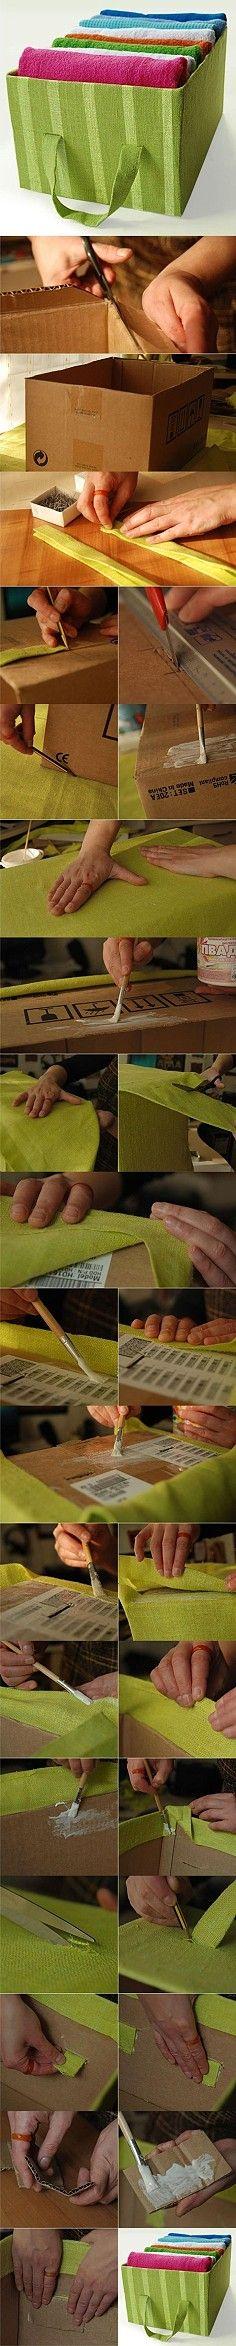 Caja de Almacenaje de la ropa del hecha en casa